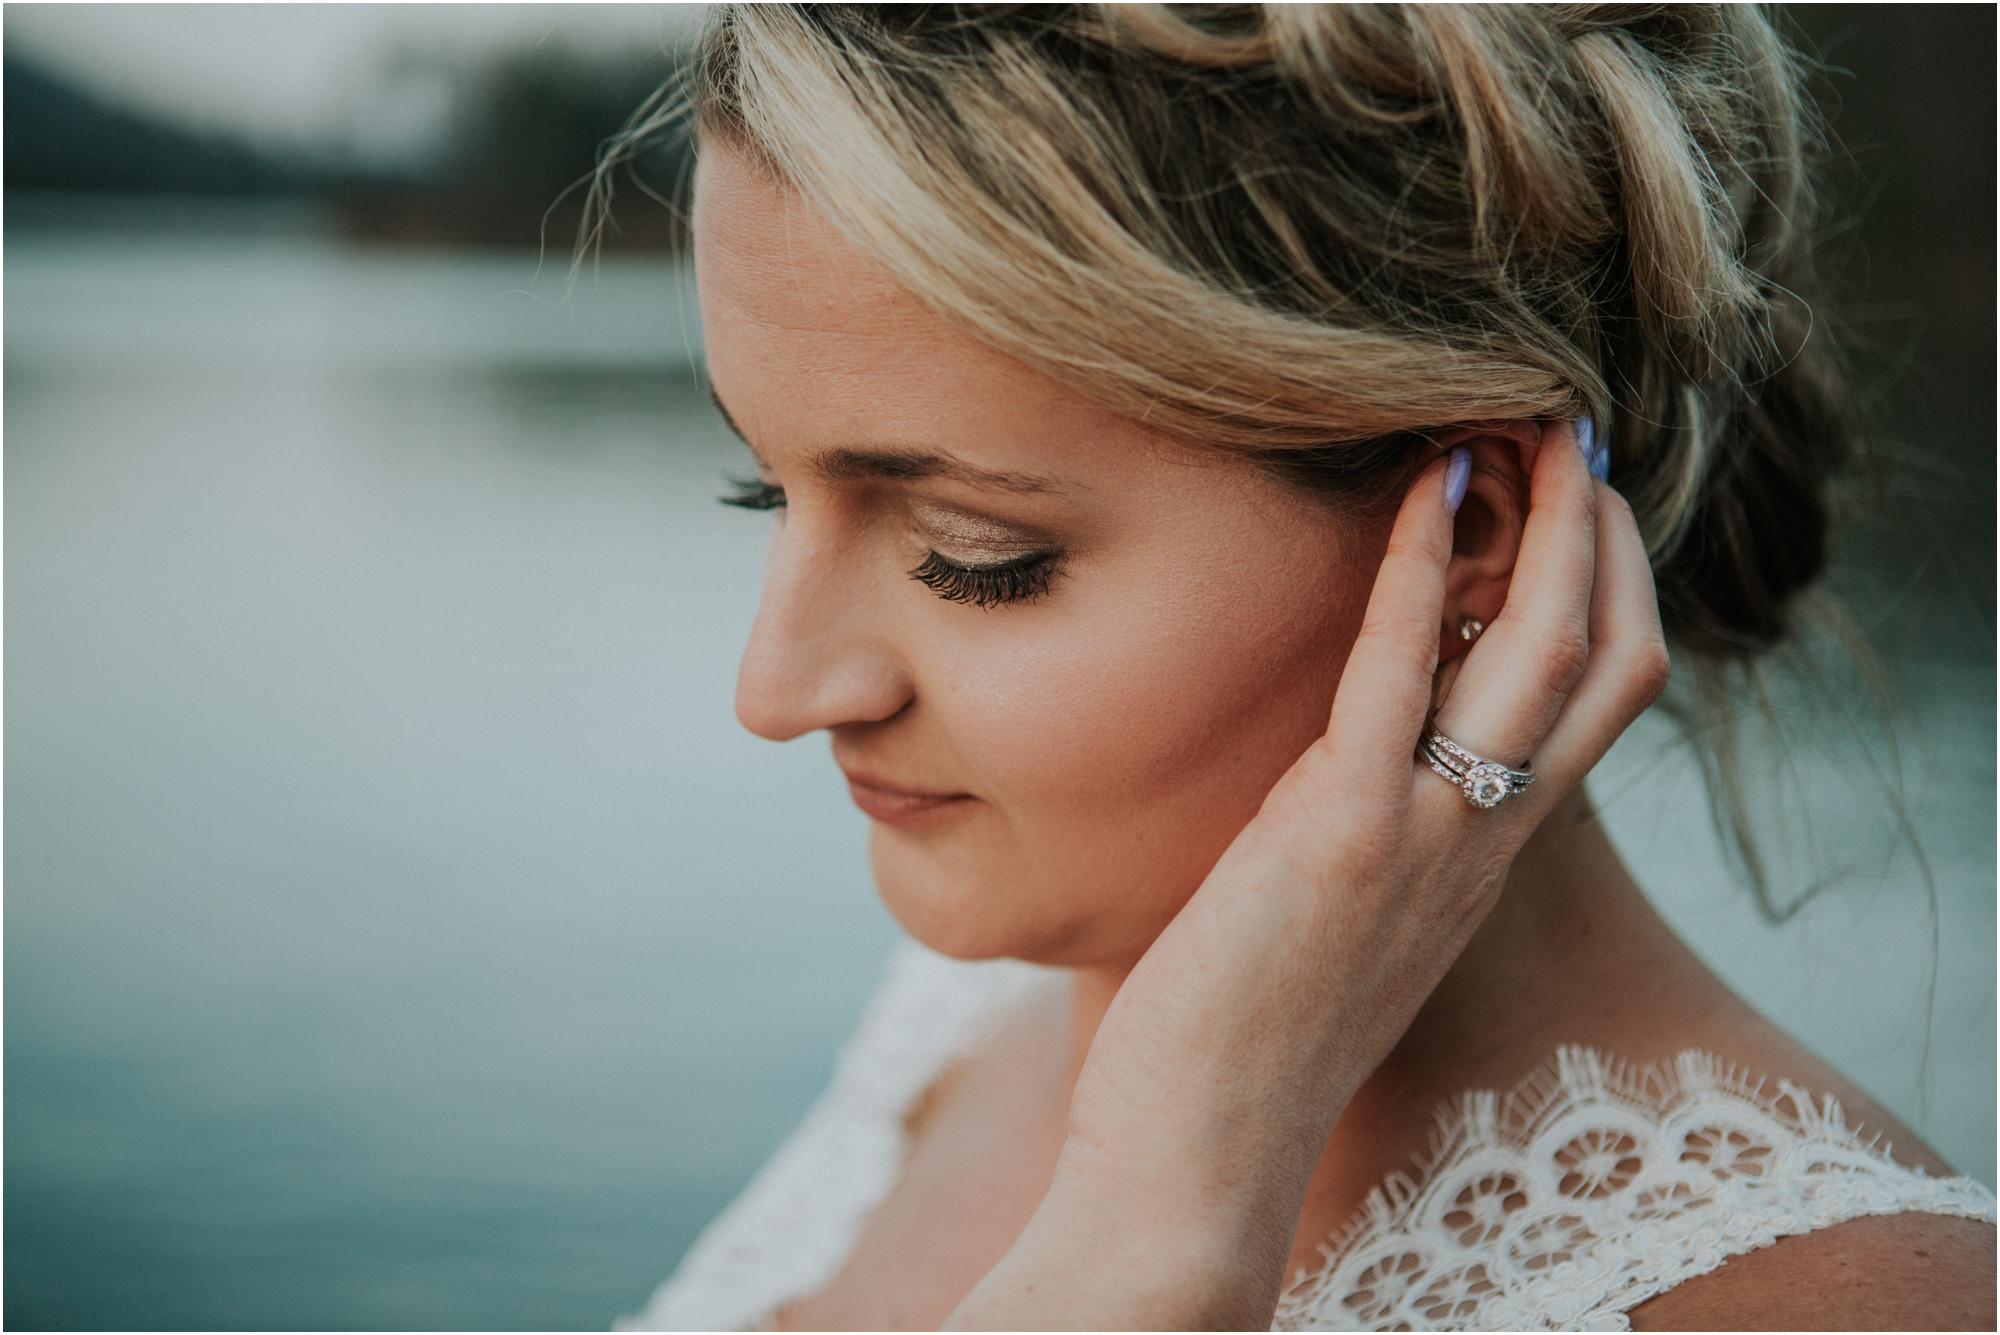 watauga-lake--bohemian-bridal-styled-session-northeast-tennessee-wedding-elopement-photography_0016.jpg